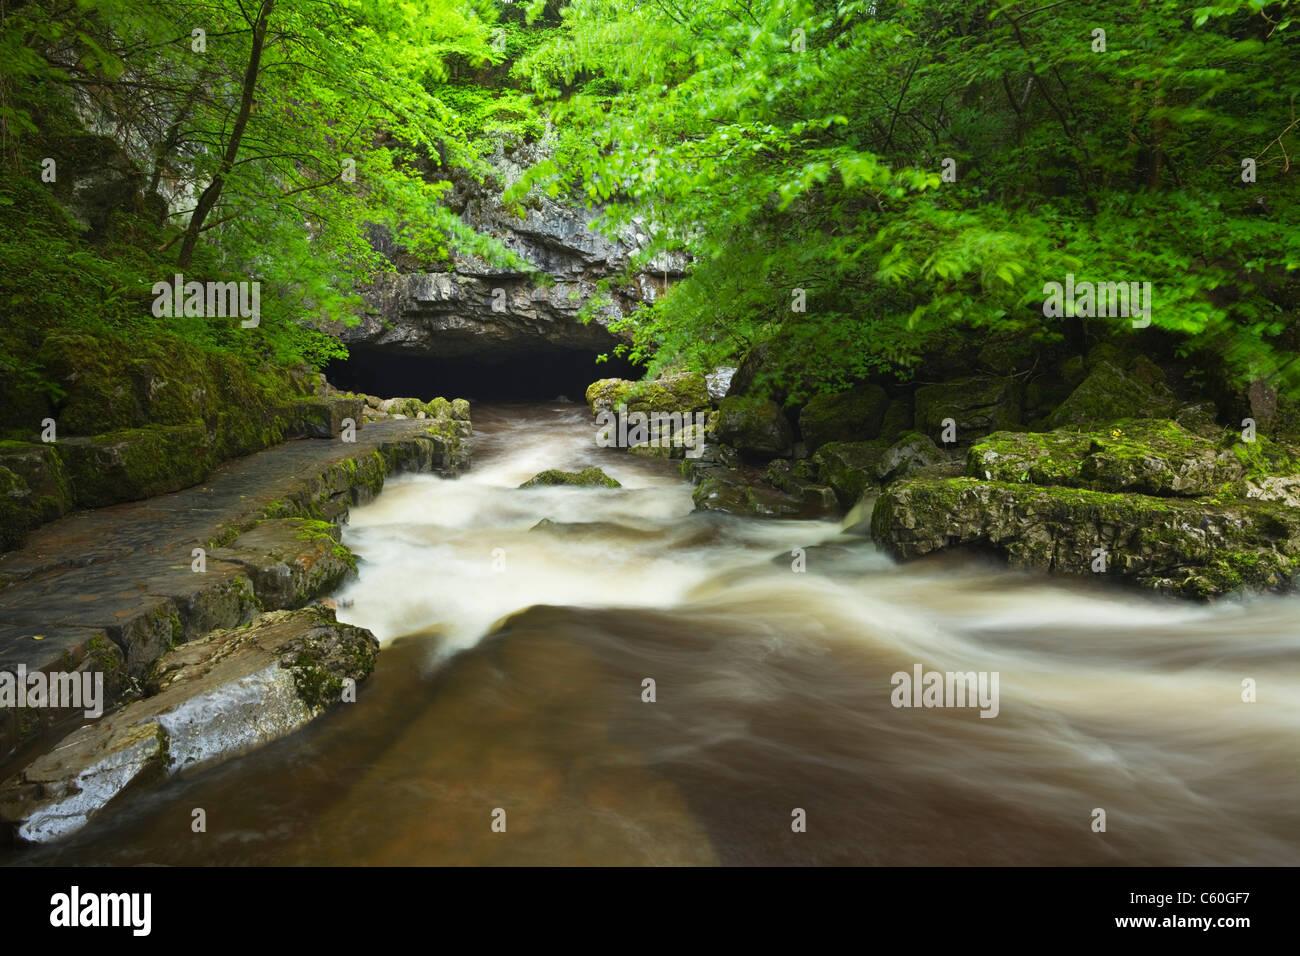 Río Mellte fluyen a Porth yr Ogof Ystradfellte cueva cerca. Parque Nacional de Brecon Beacons. Powys. País de Gales. Foto de stock